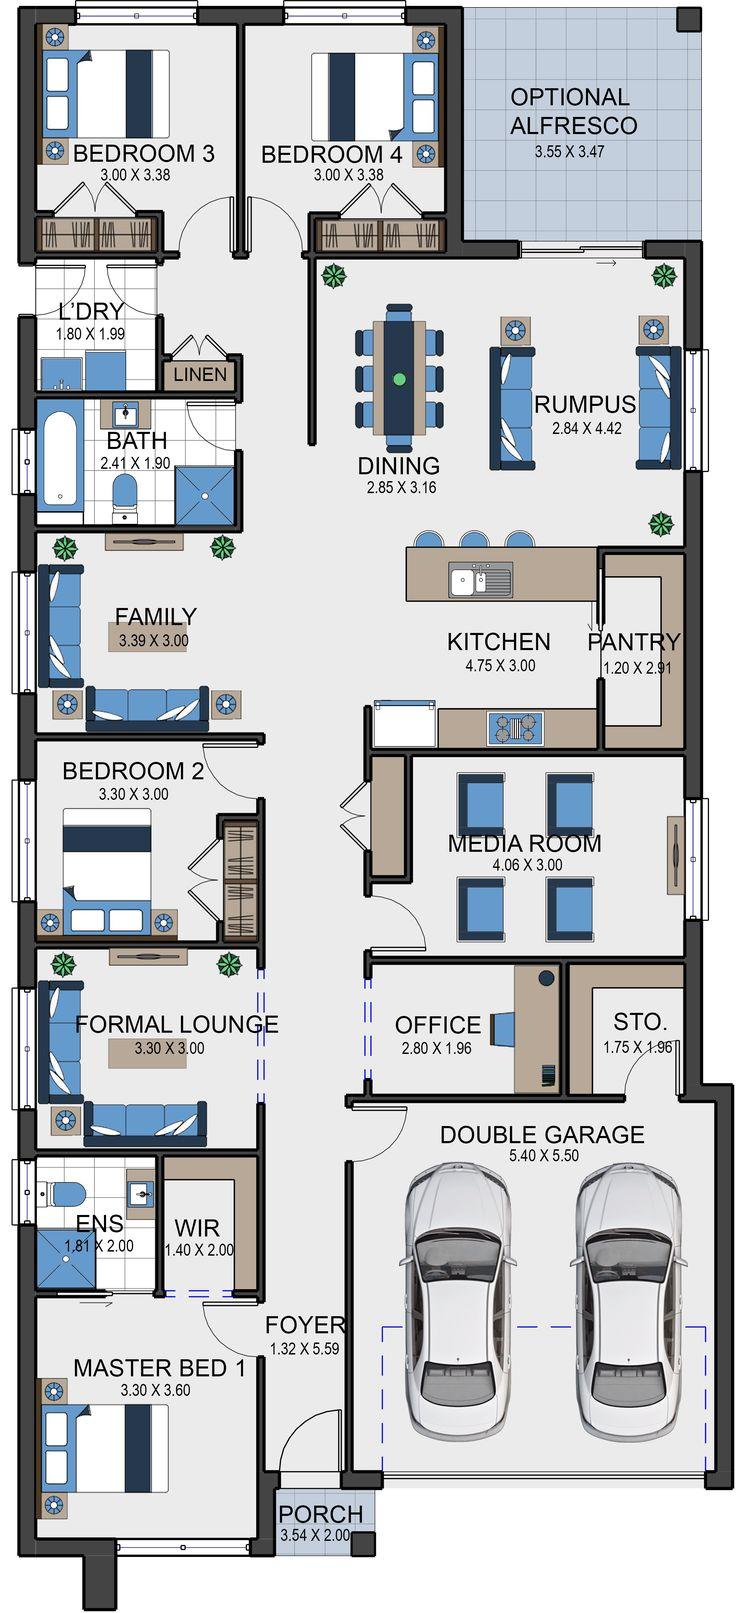 3 Bedroom 2 Bath Ranch Floor Plan Prime New in House Designerraleigh kitchen